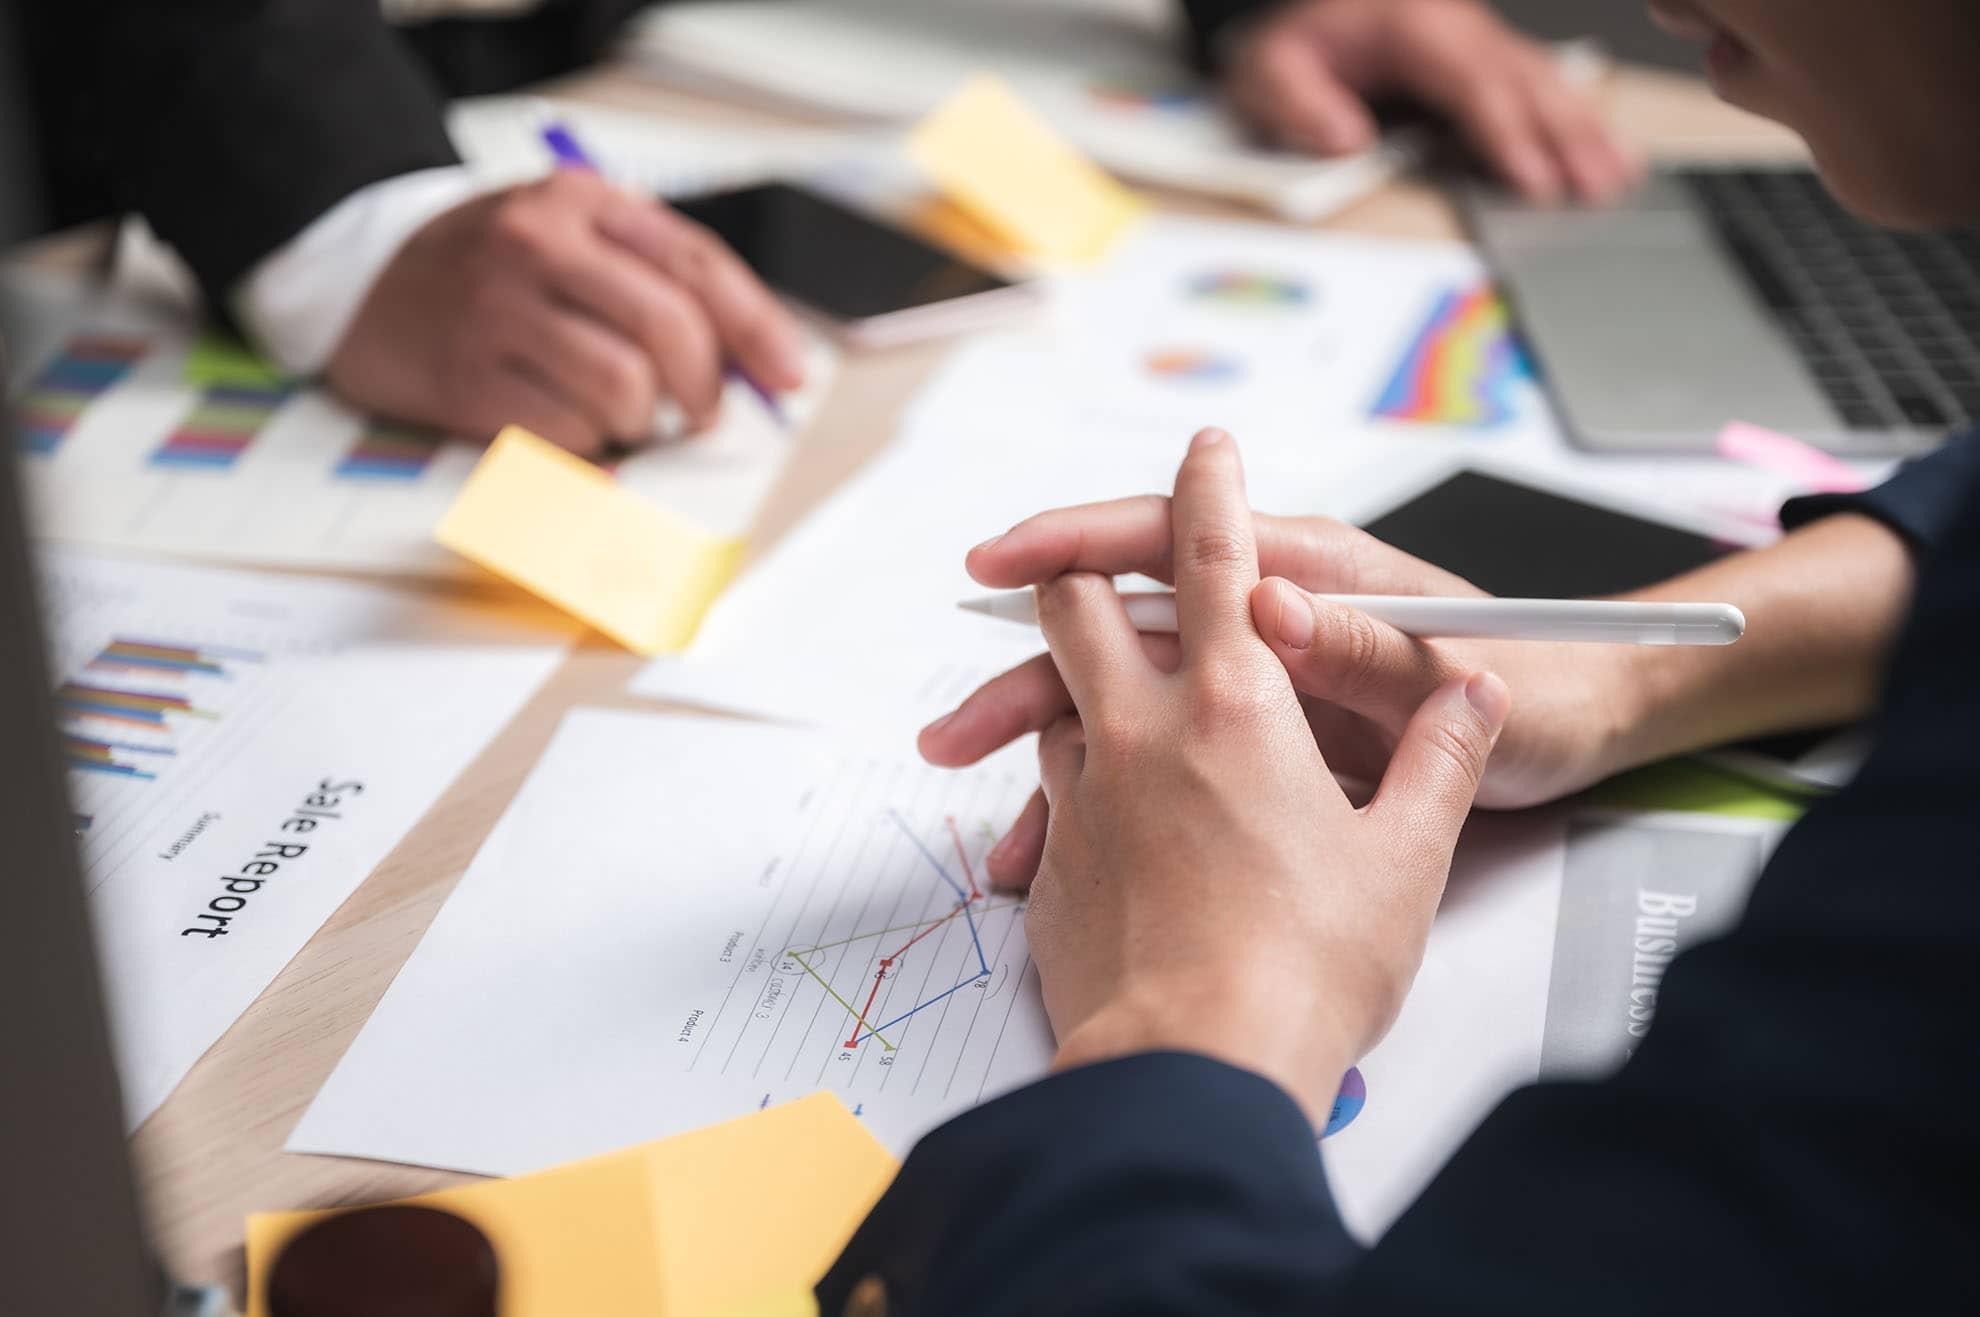 business-teamwork-concept-marketing-strategy-brain-8RRFGLR-min